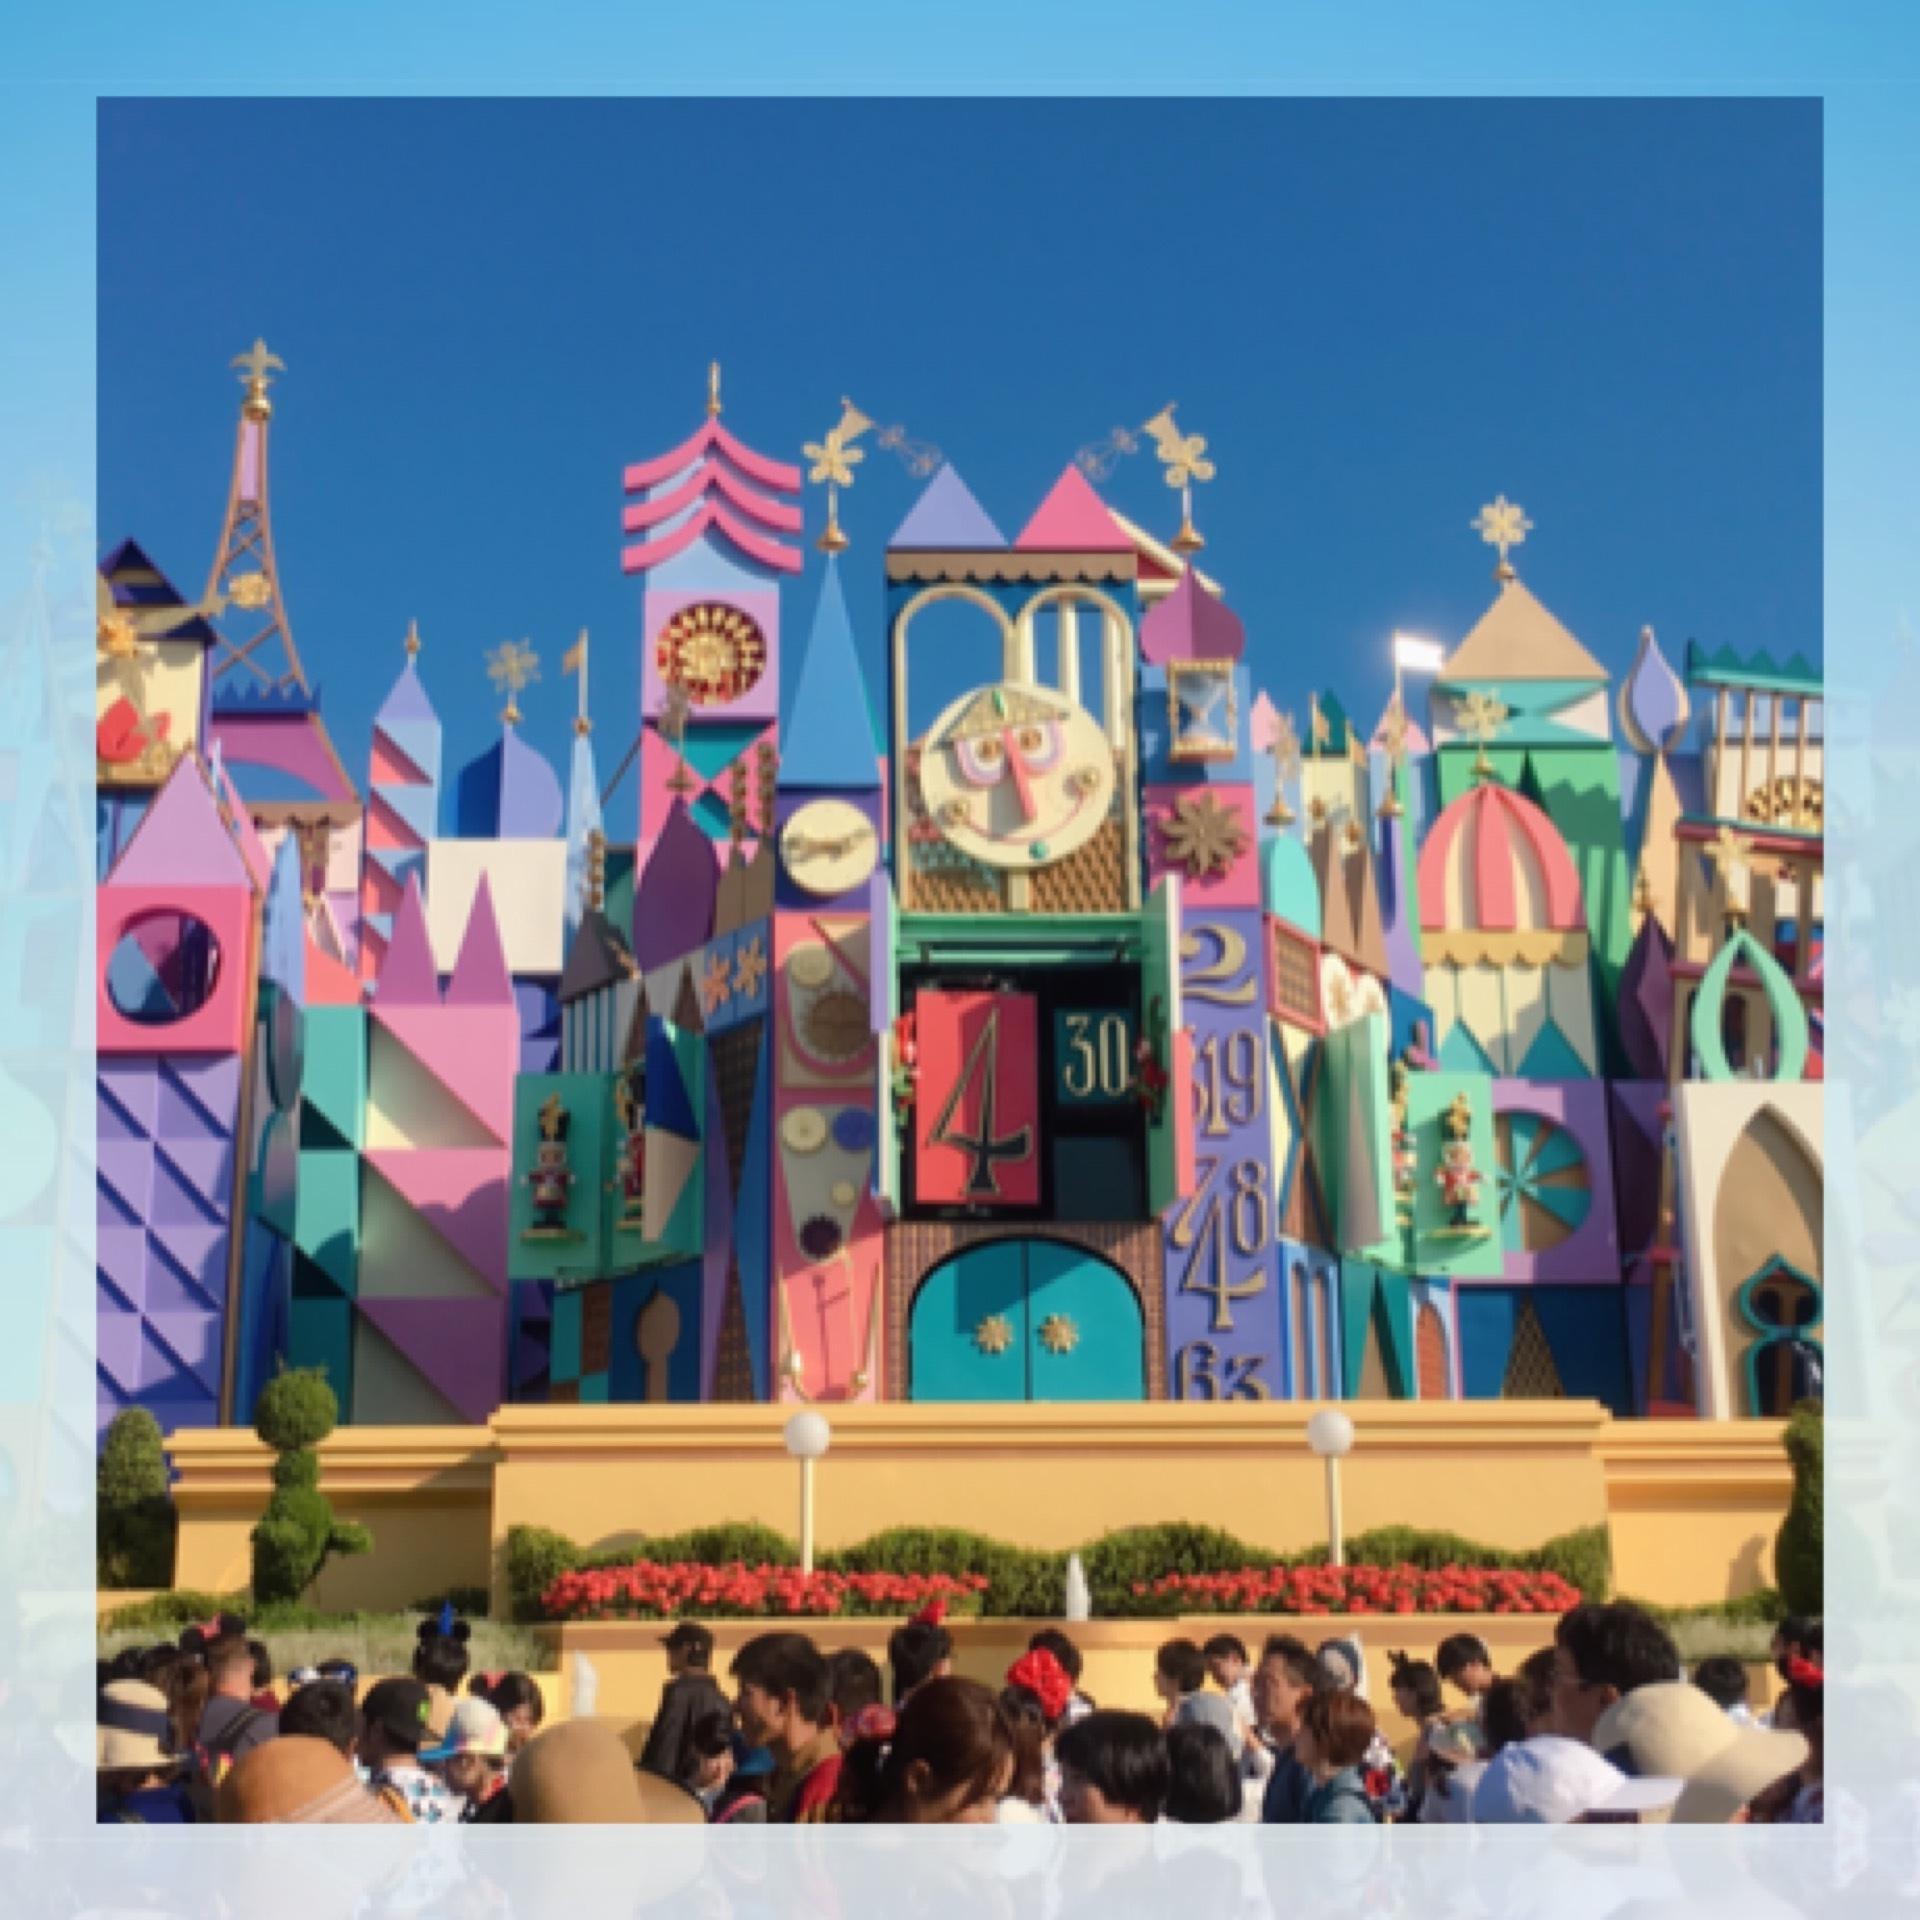 Tokyo Disneyland《 35 Happiest Gelebration! 》に行ってきました♫_1_4-1